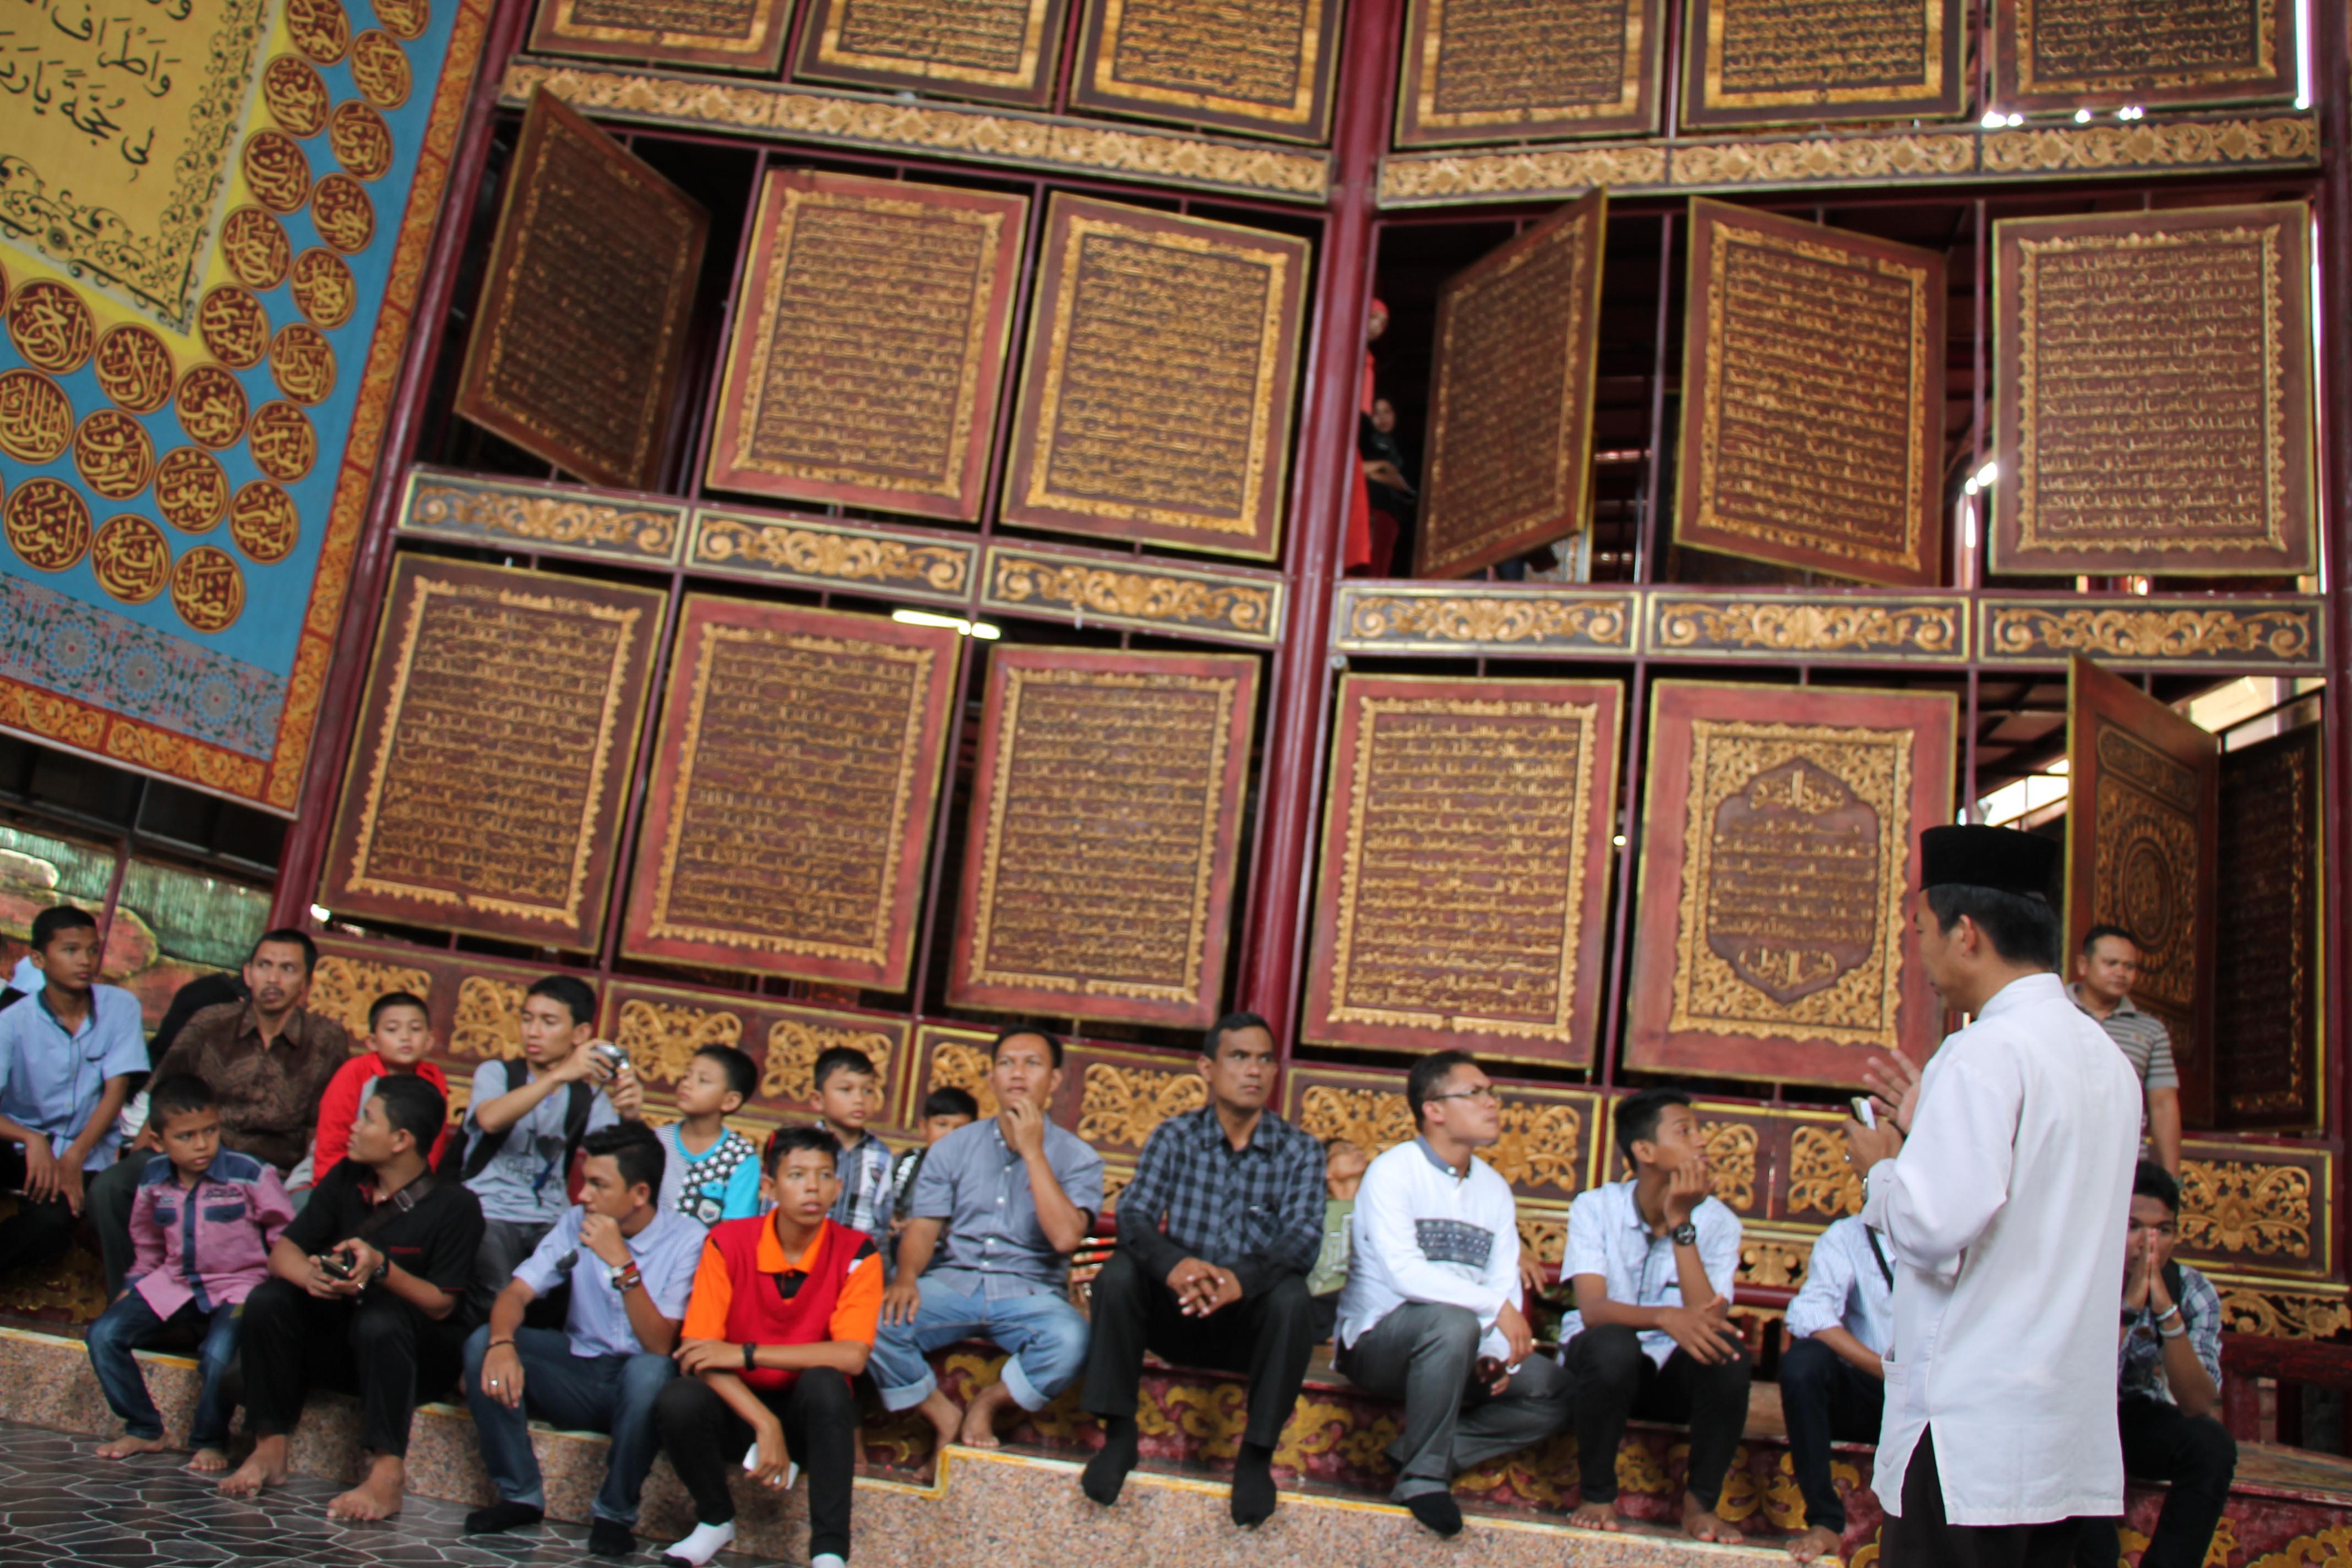 Masjid Cheng Ho Museum Badaruddin Jembatan Ampera Sriwijaya Baytul Quran